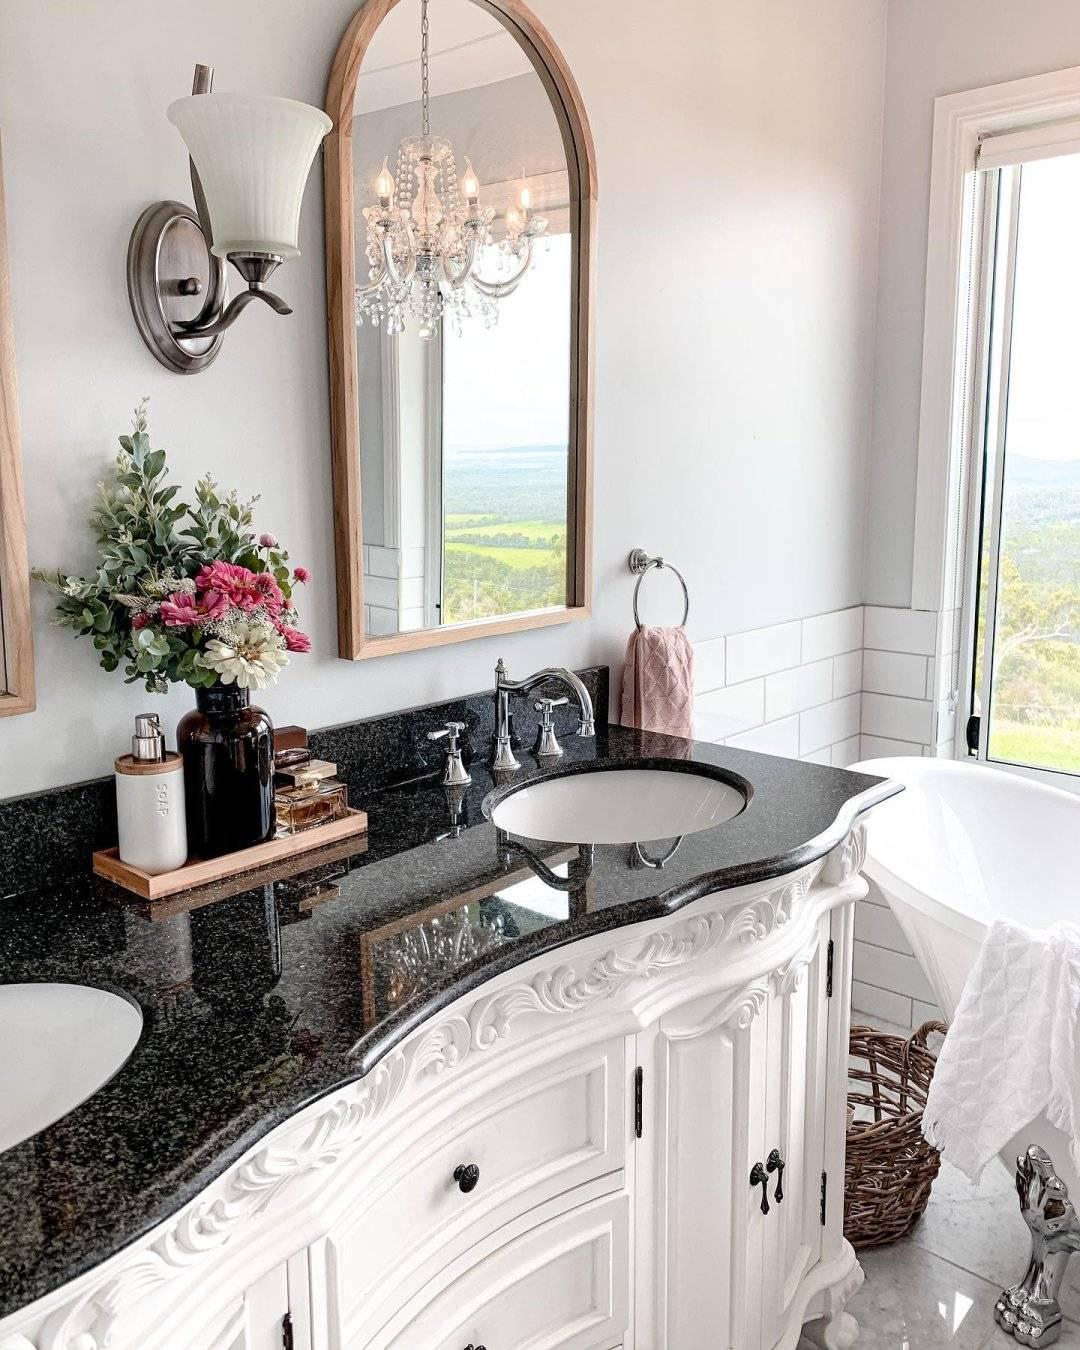 Painted Bathroom Vanity - Jolie Paint Palace White